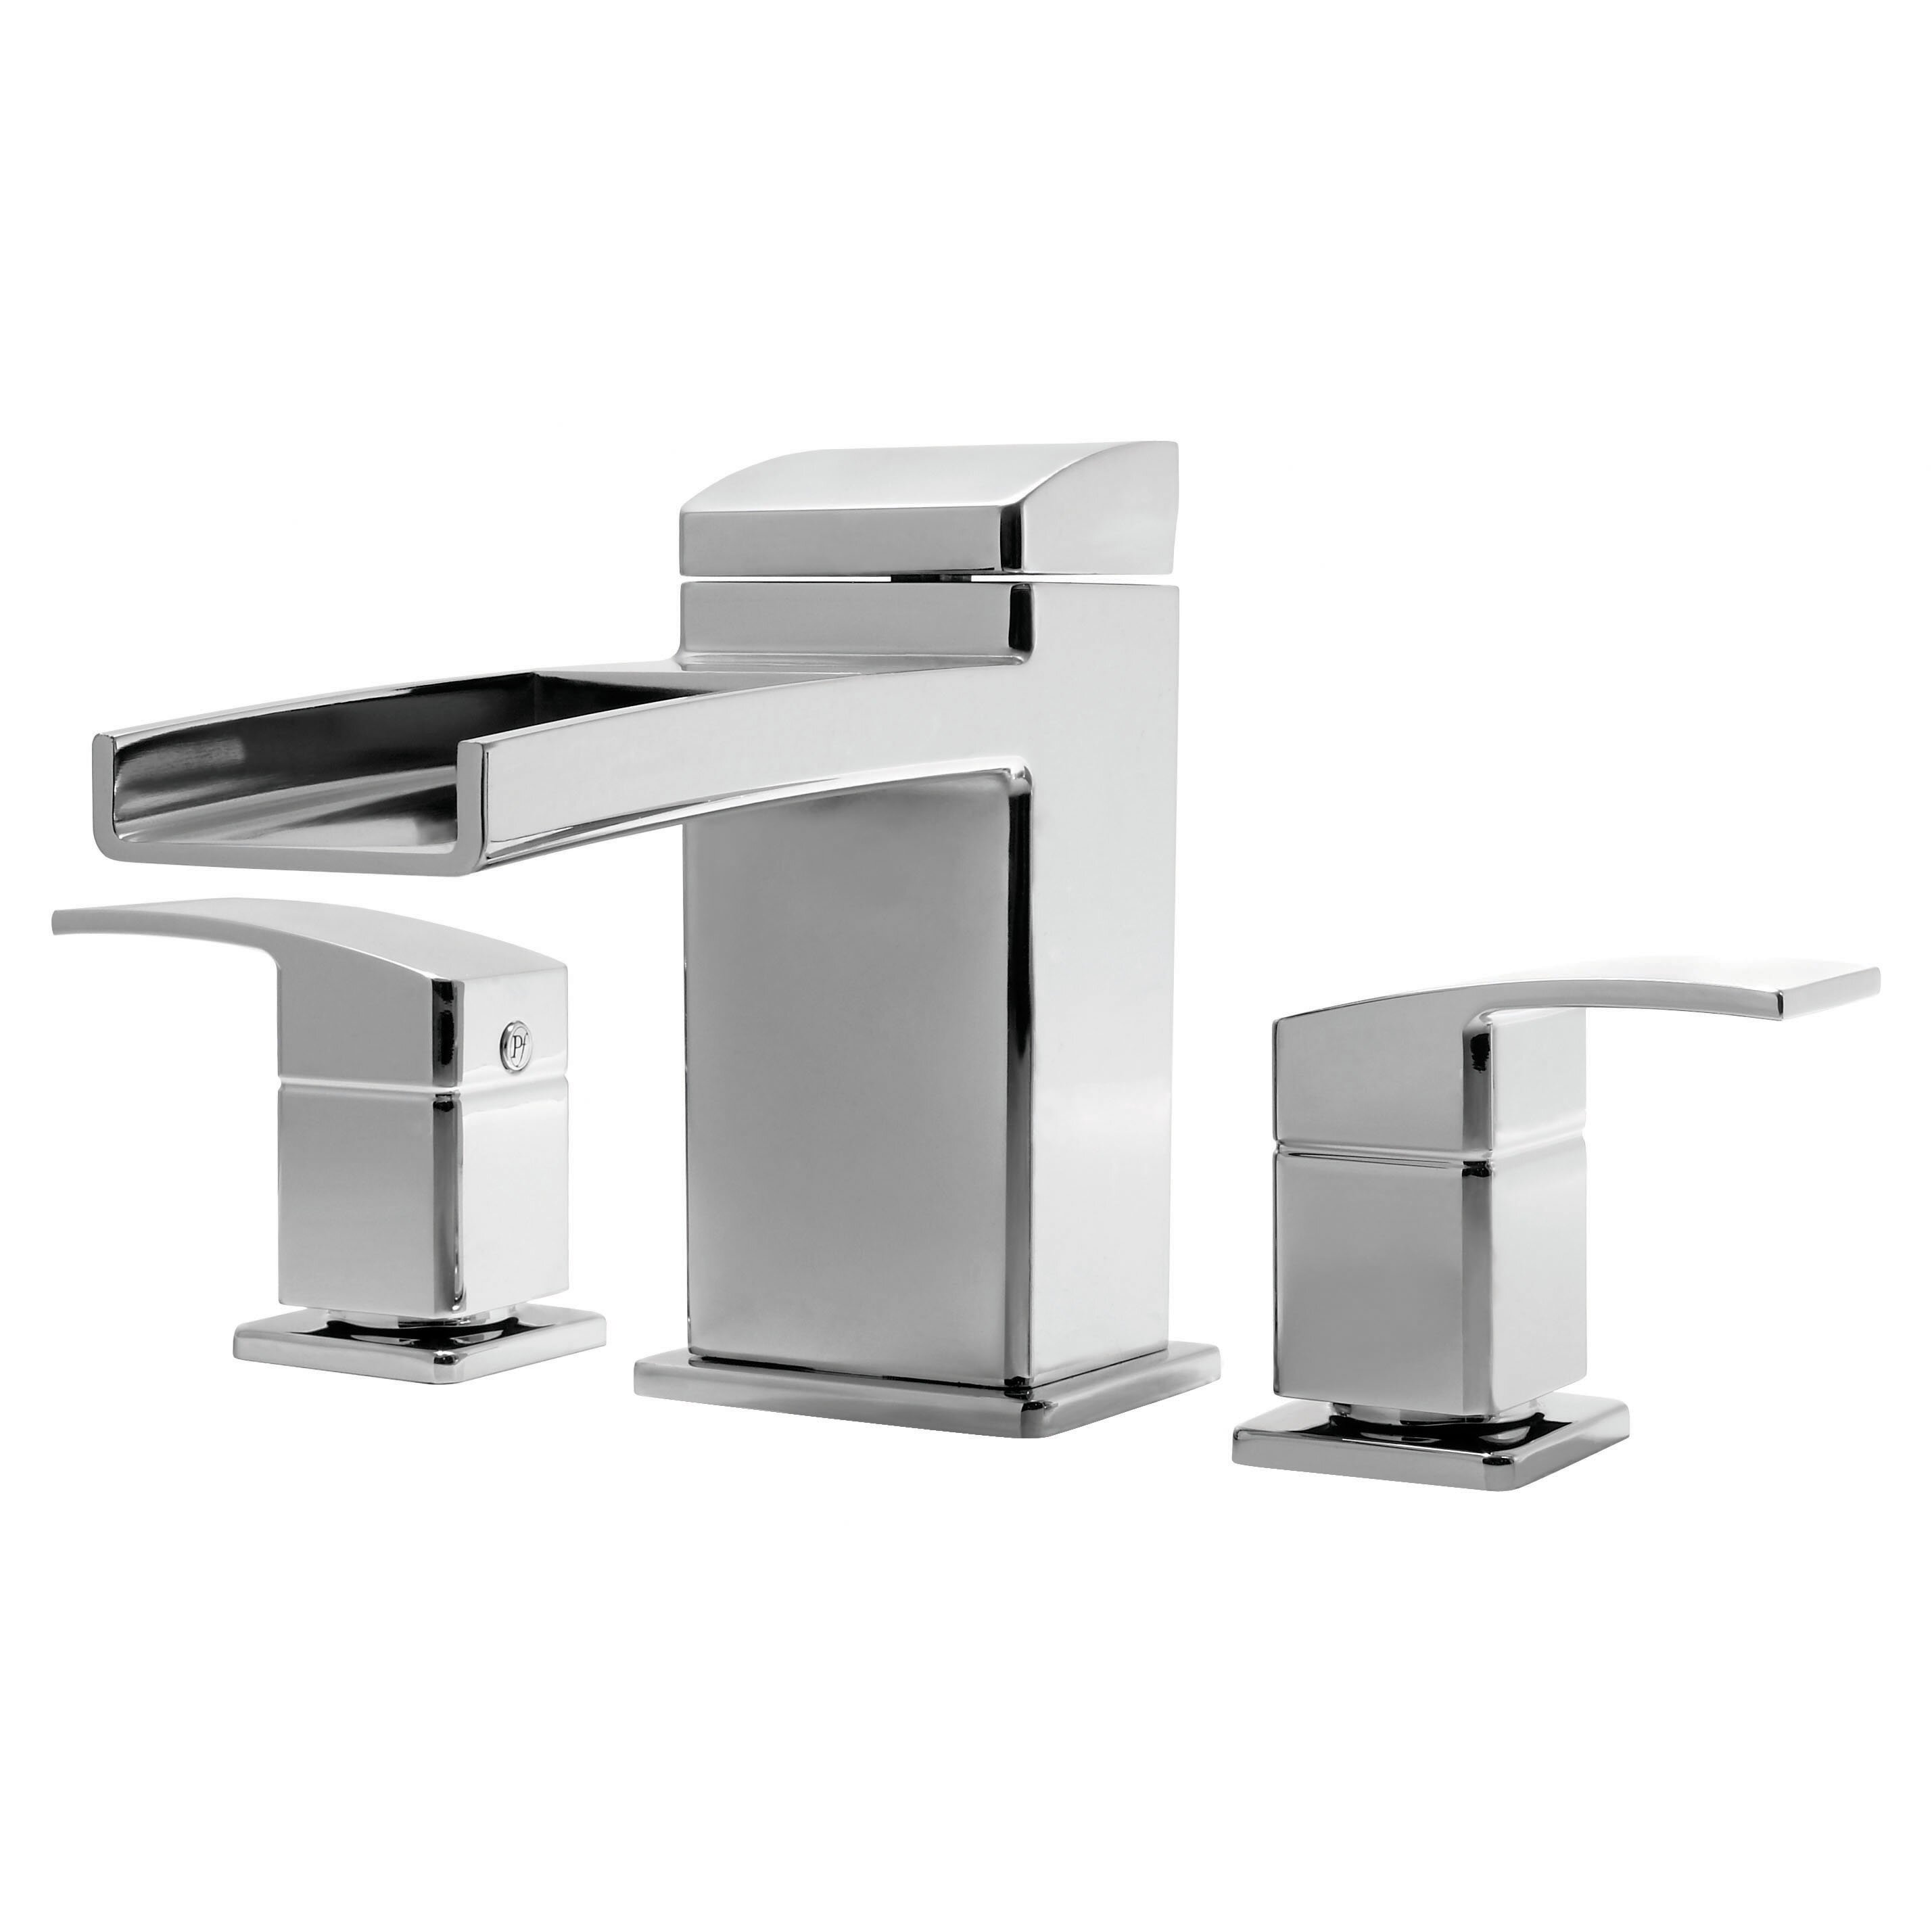 kenzo two handle deck mount roman tub faucet trim pfister wayfair - Pfister Faucets